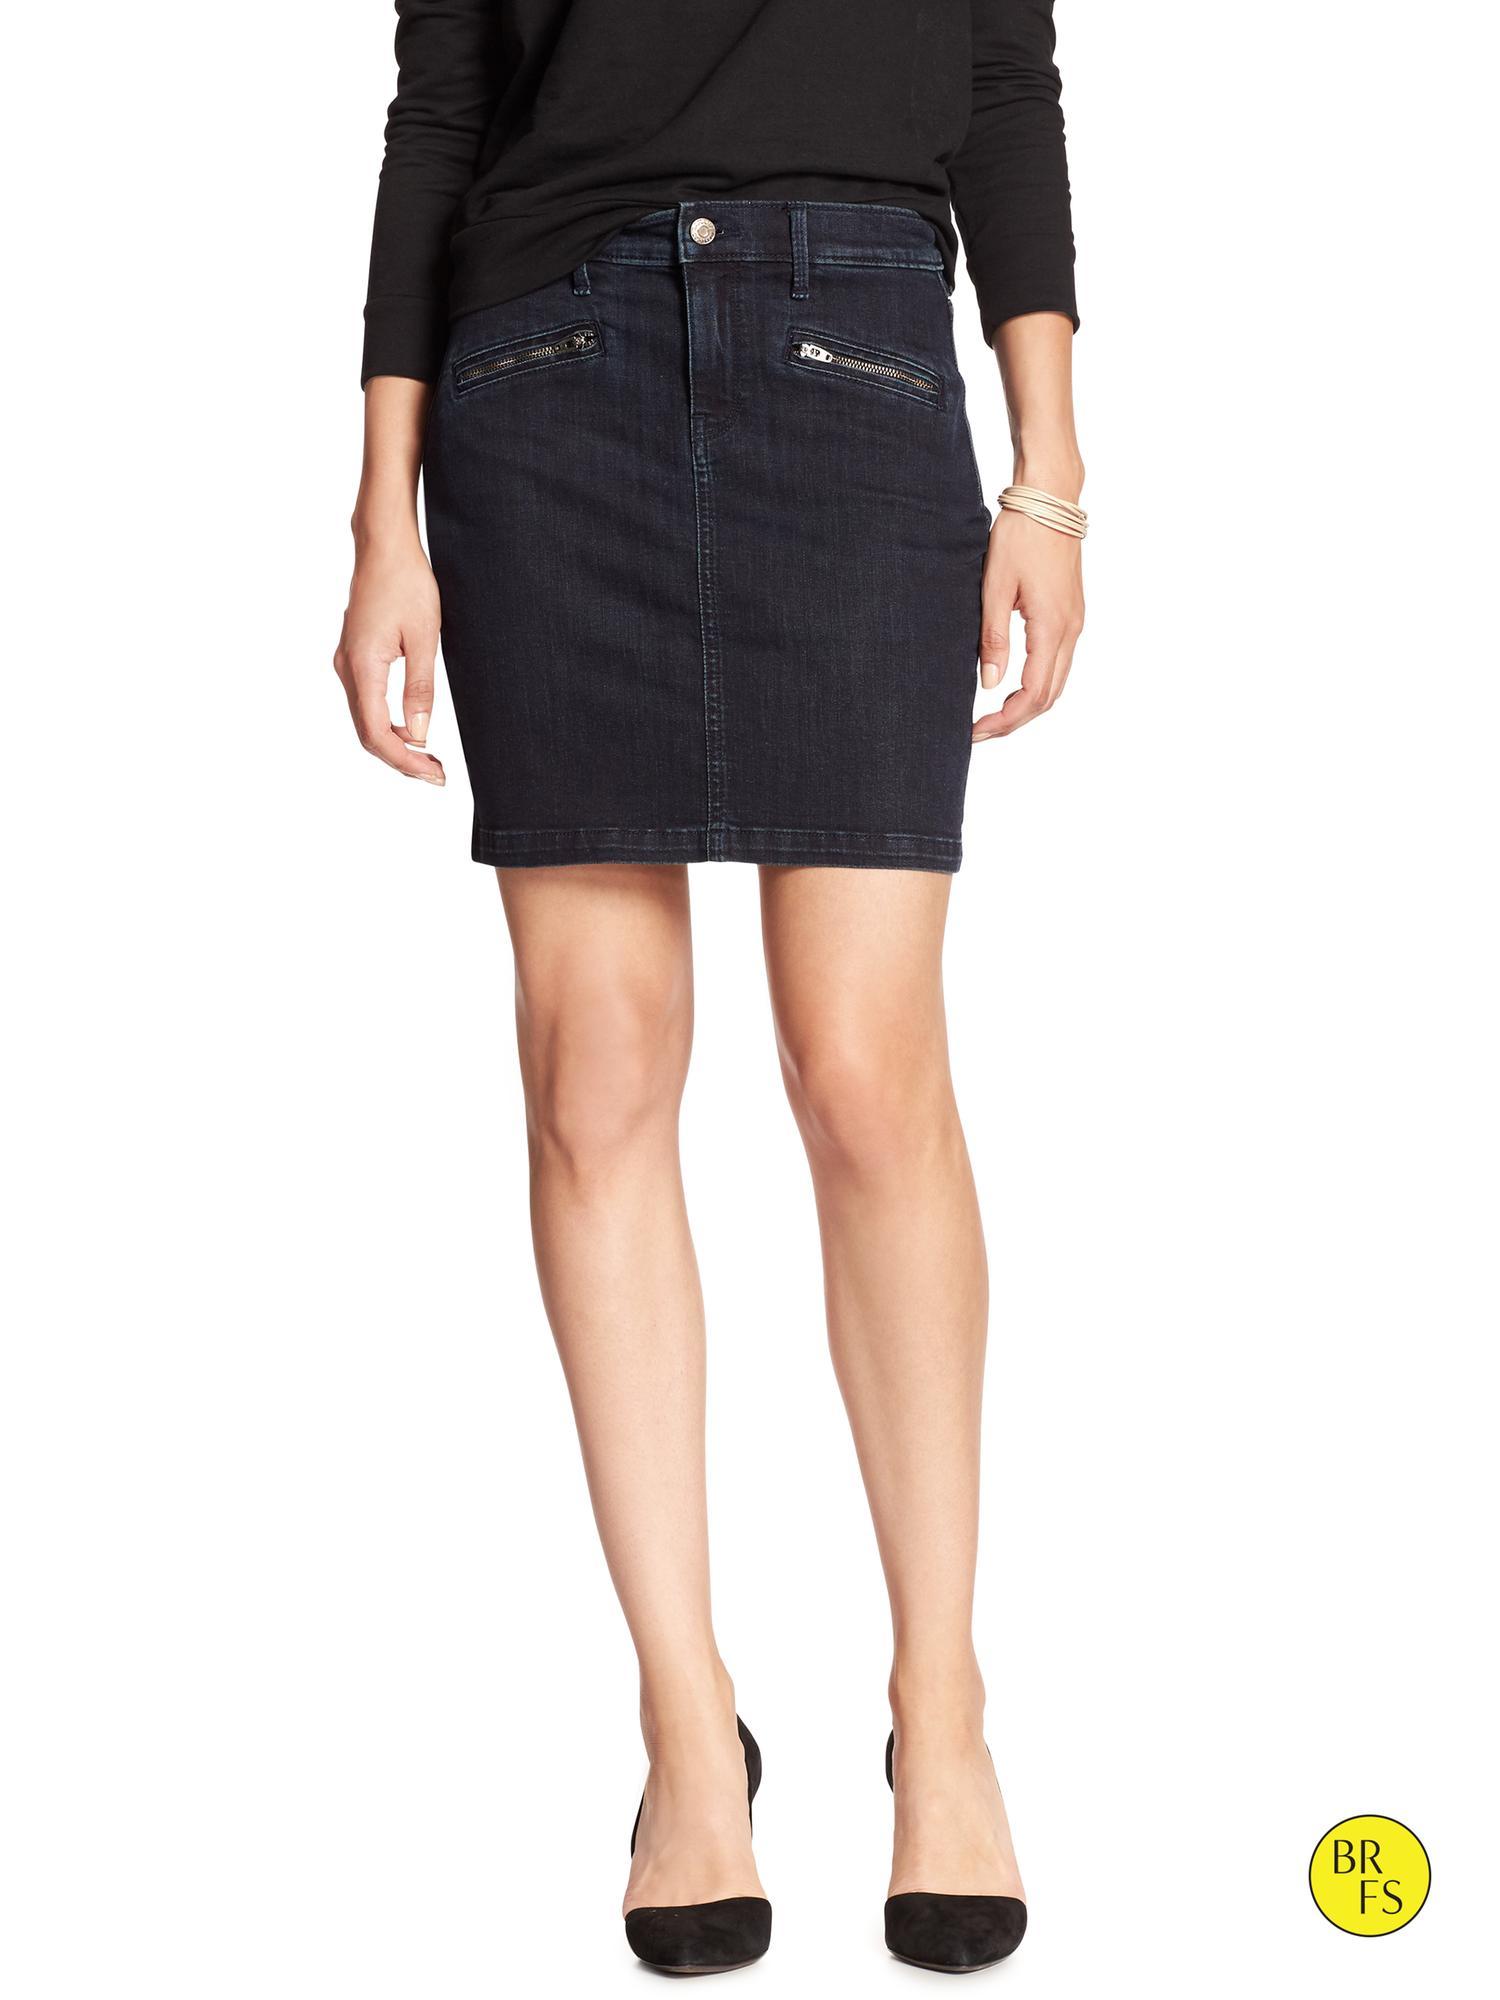 banana republic factory denim skirt in black wash